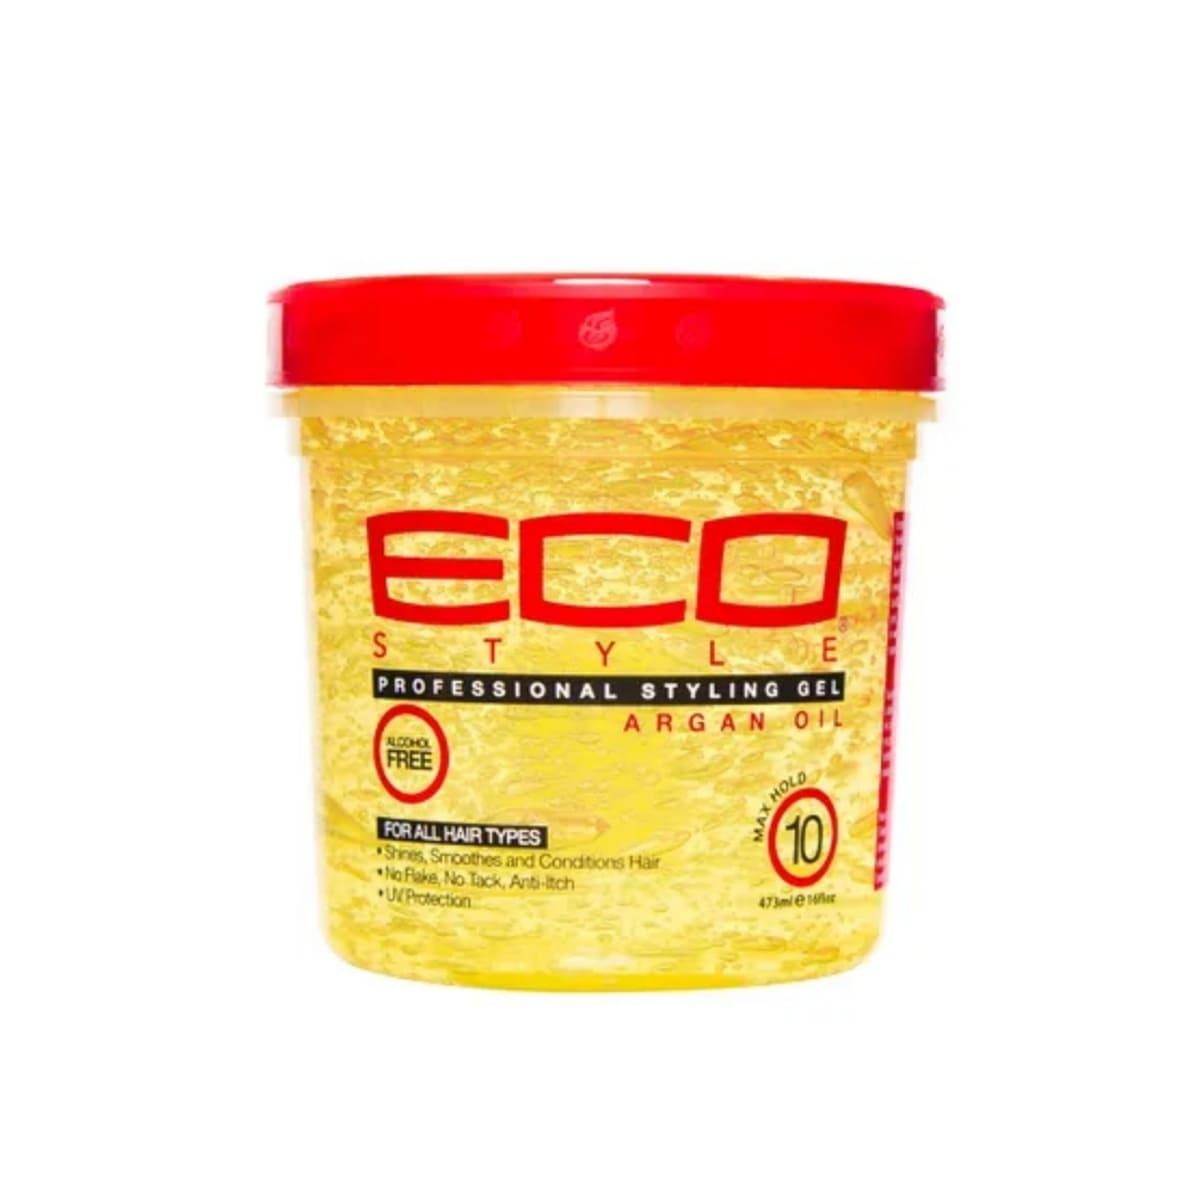 comprar-cosmetico-vegano-gel-styling-argan-oil-ecostyler-metodo-curly-trenzas-crochet-pelucas-www.muerebella.com